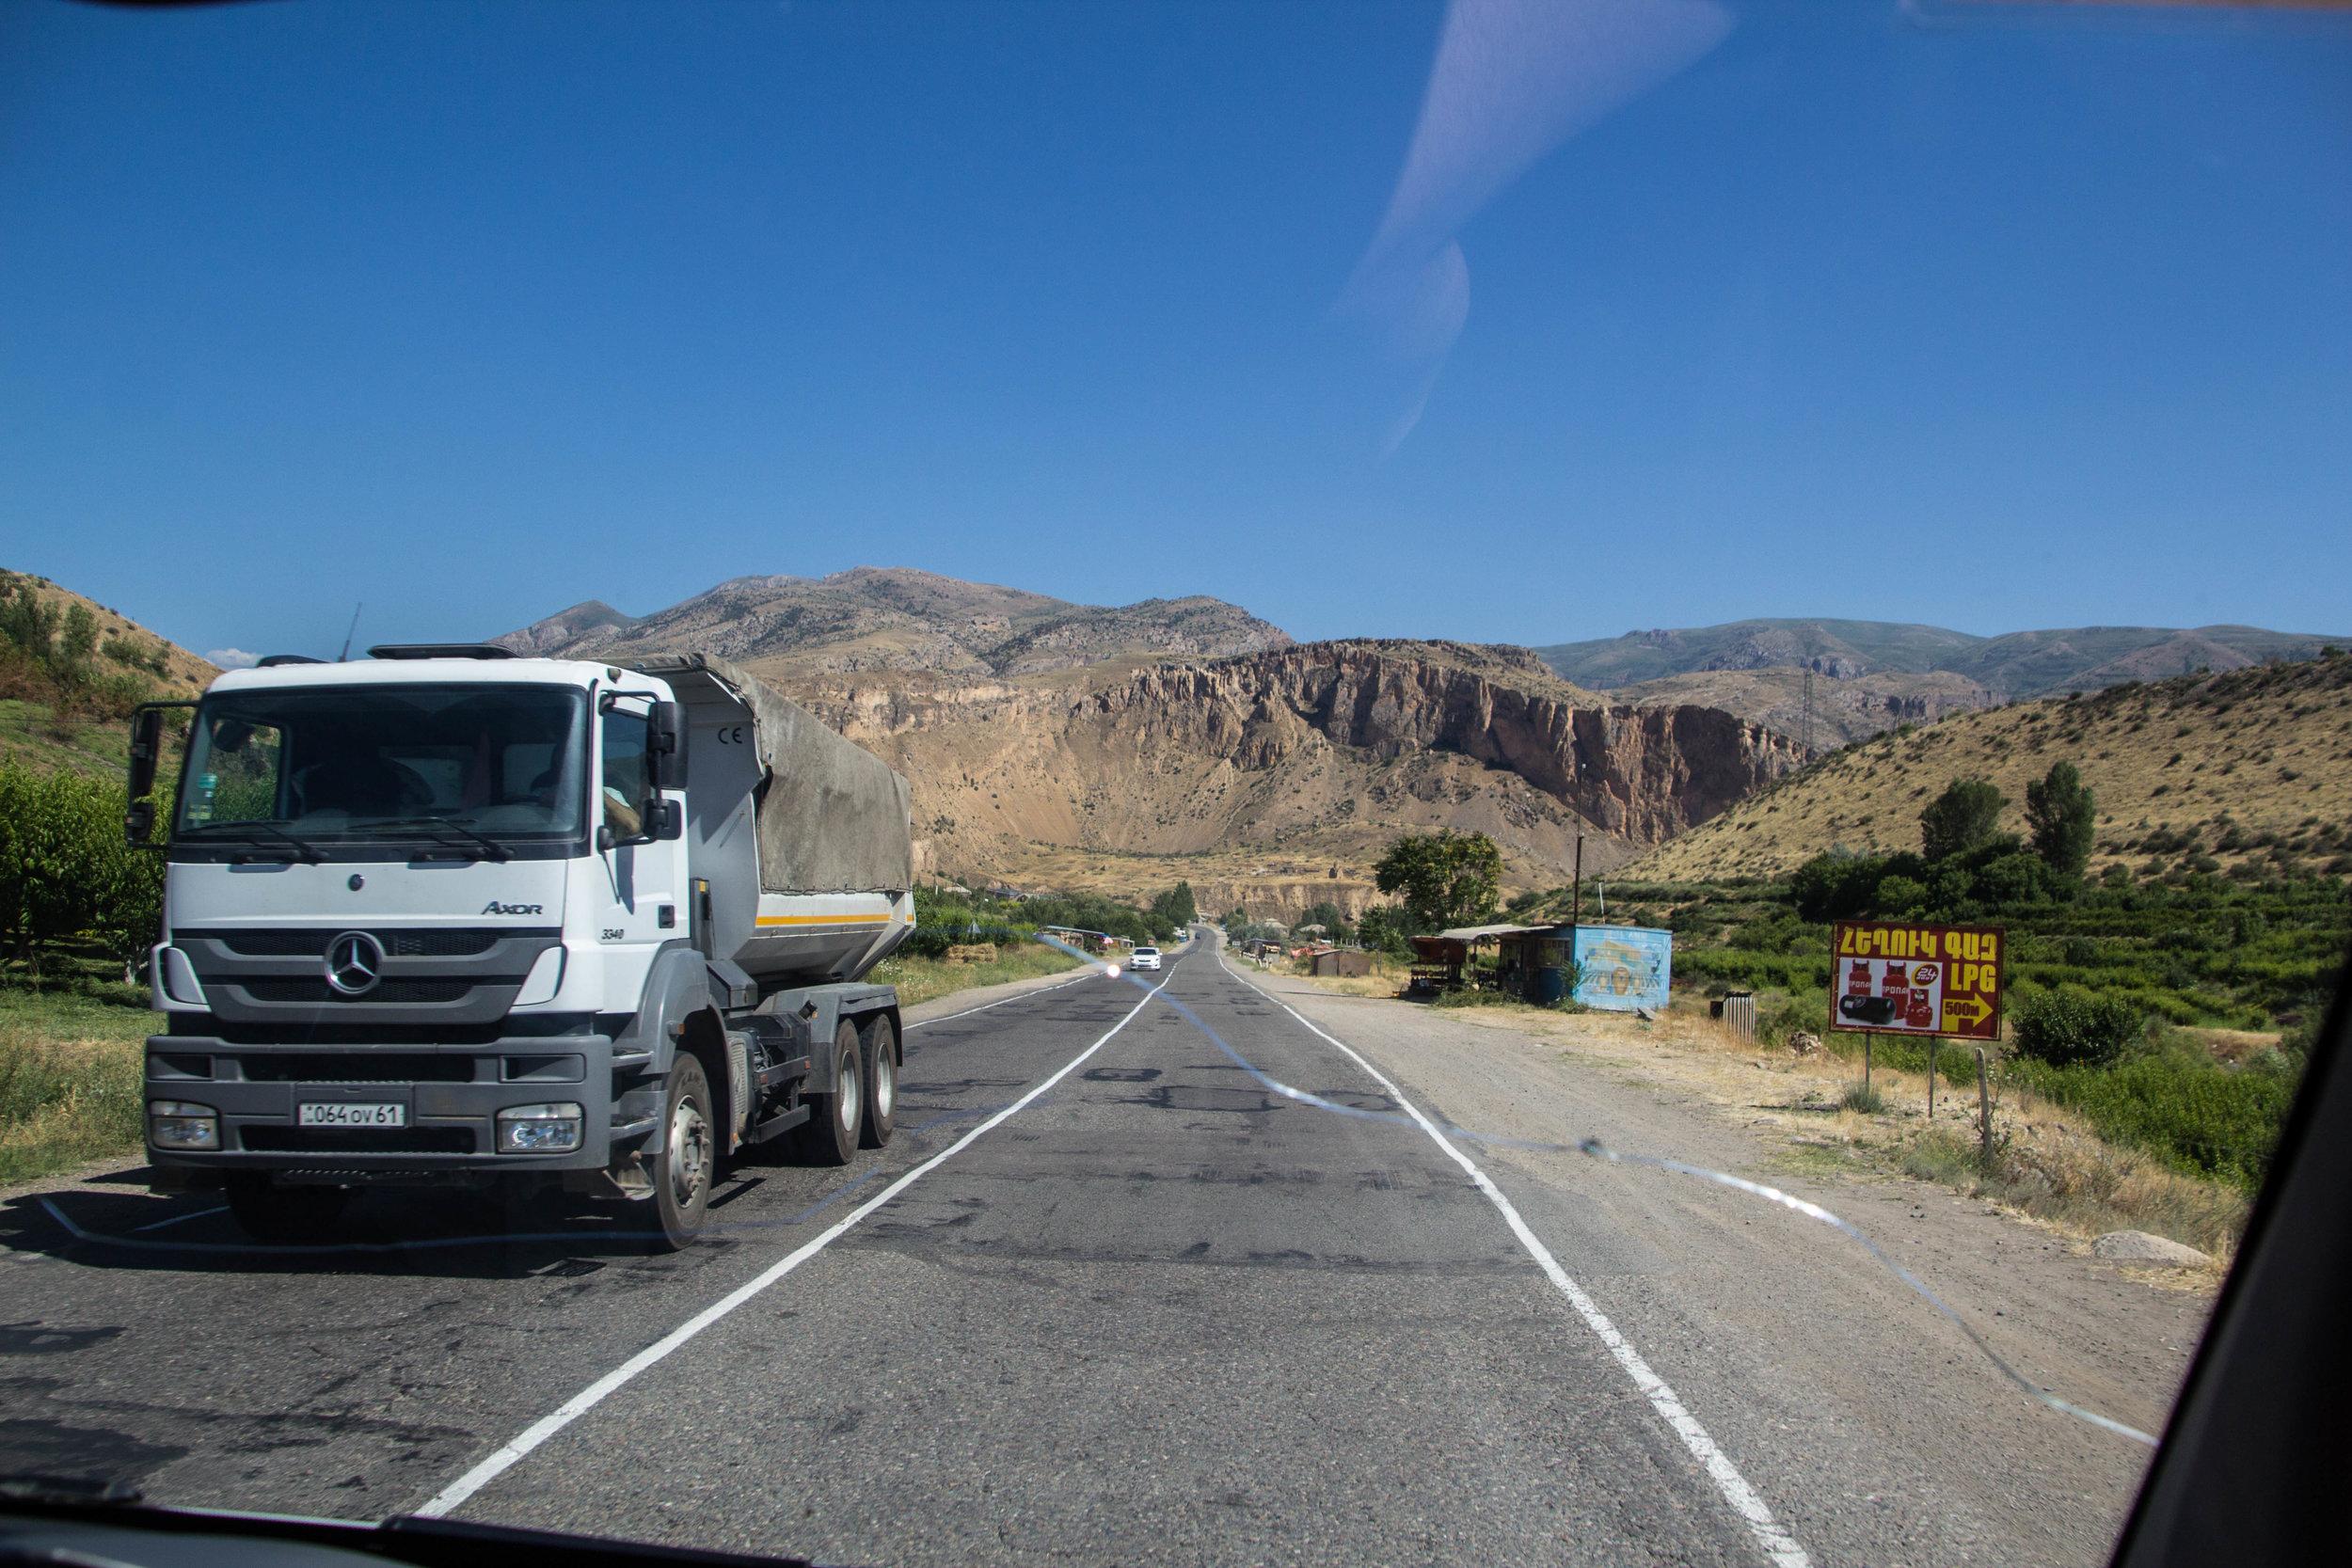 armenia-azerbaijan-southern-border-24.jpg